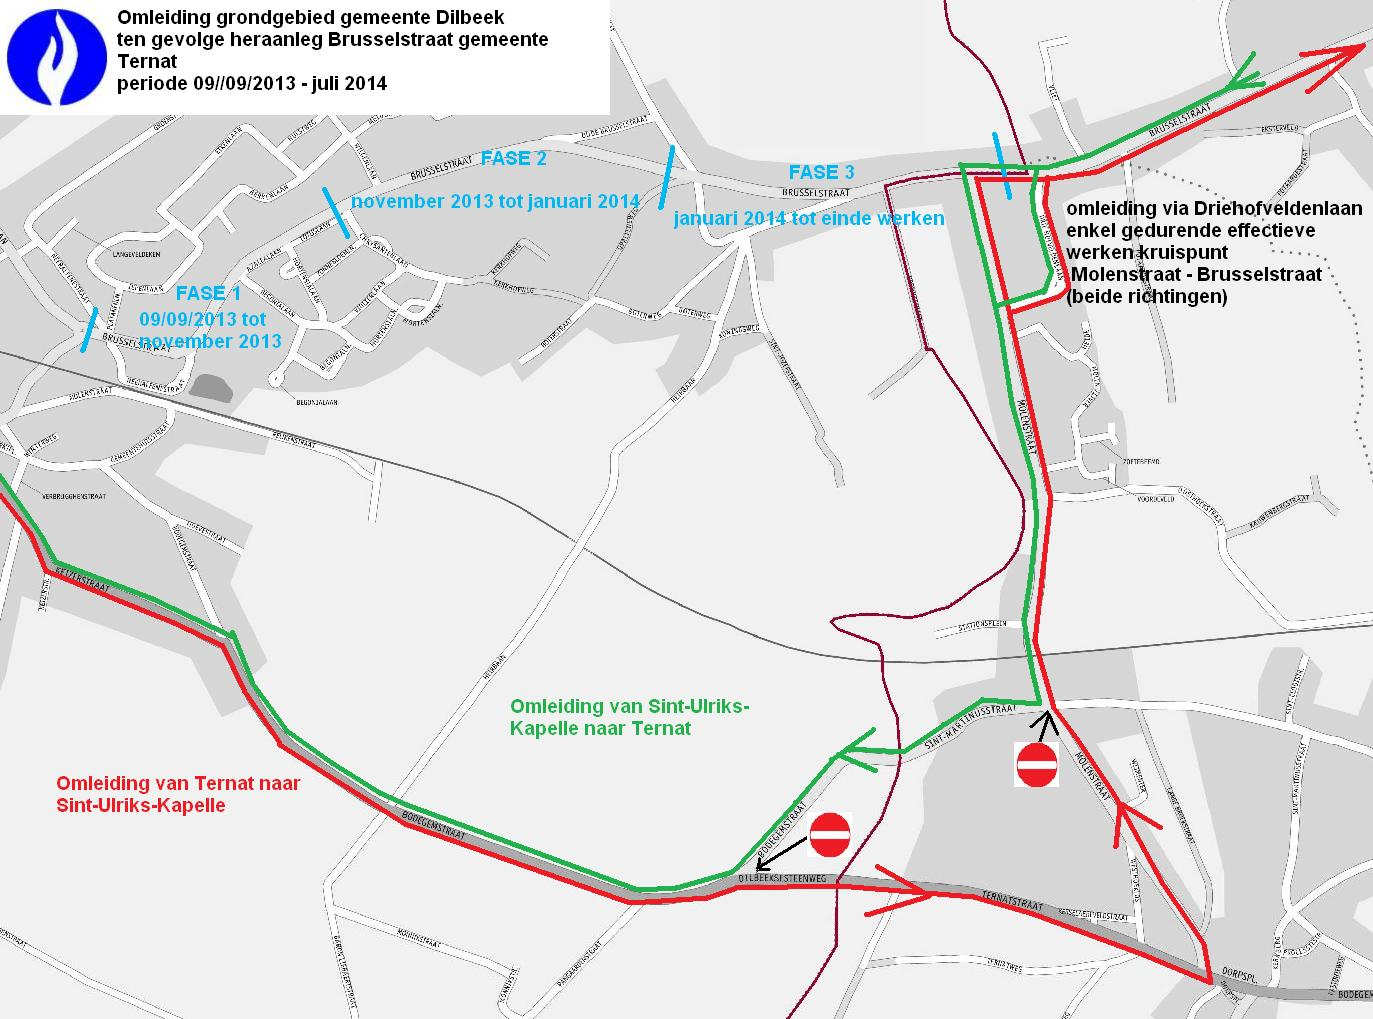 Omleiding Brusselstraat Dilbeek Ternat